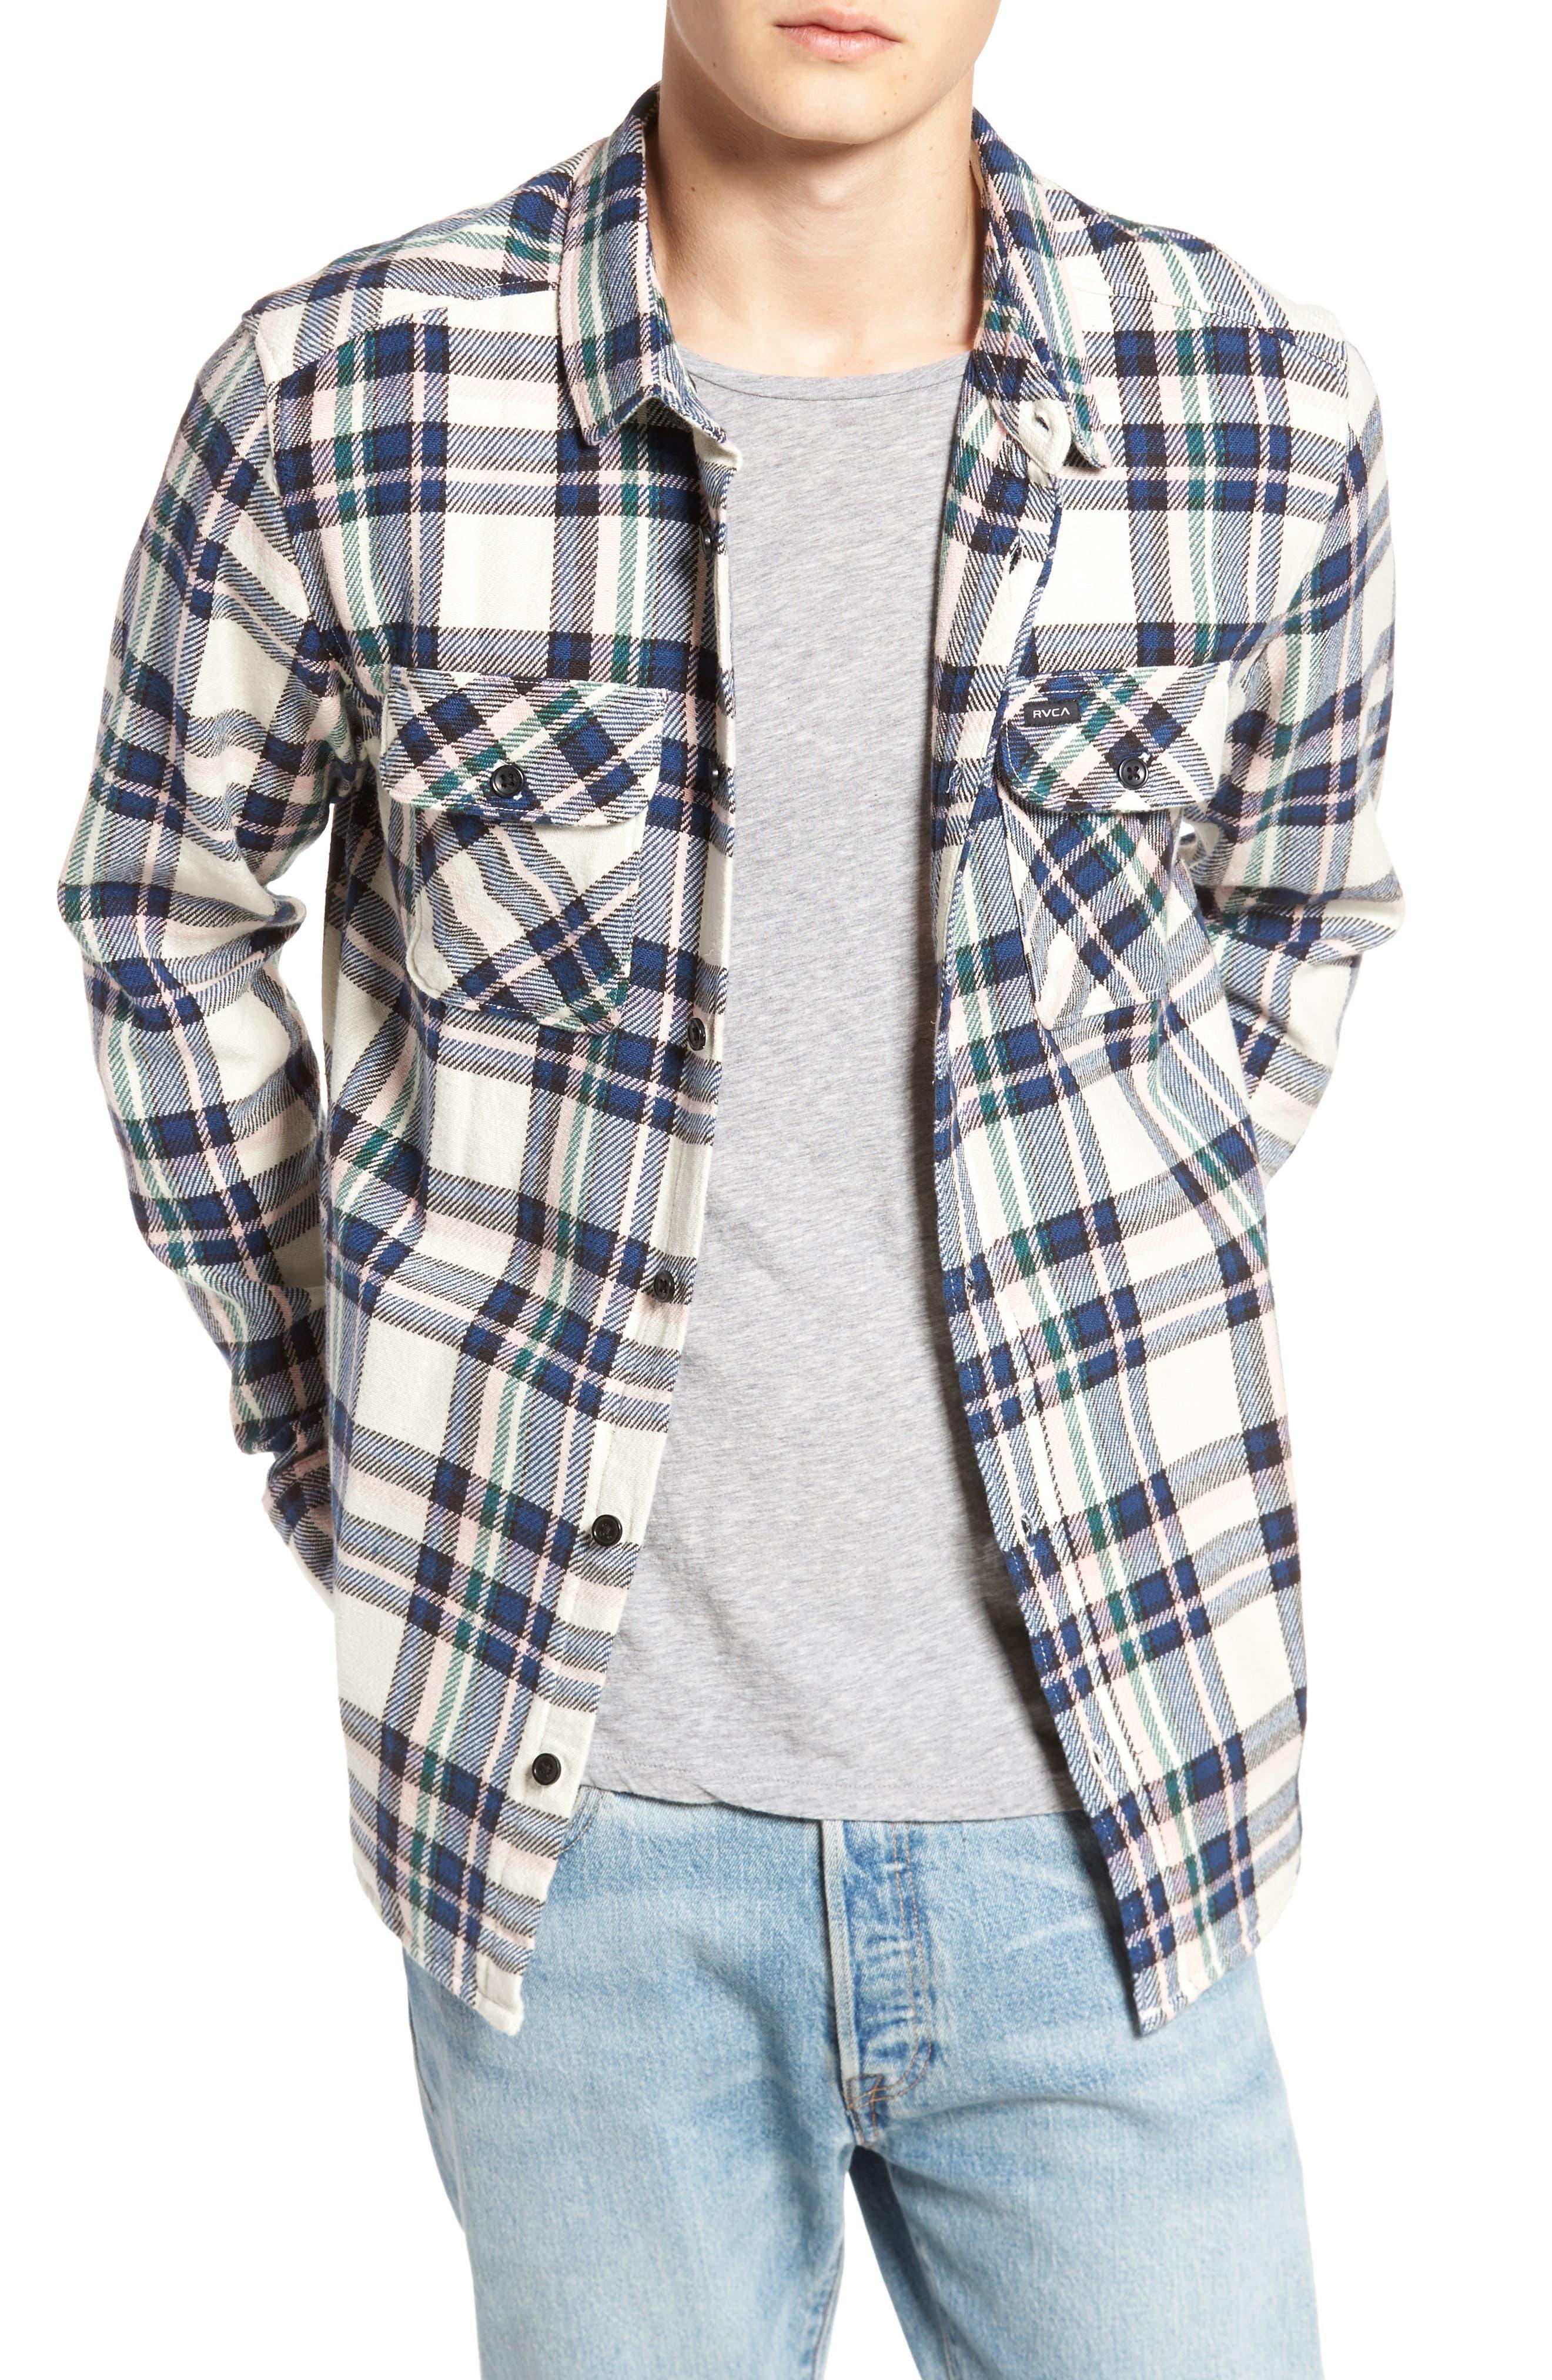 Camino Flannel Shirt,                         Main,                         color, Multi Beige